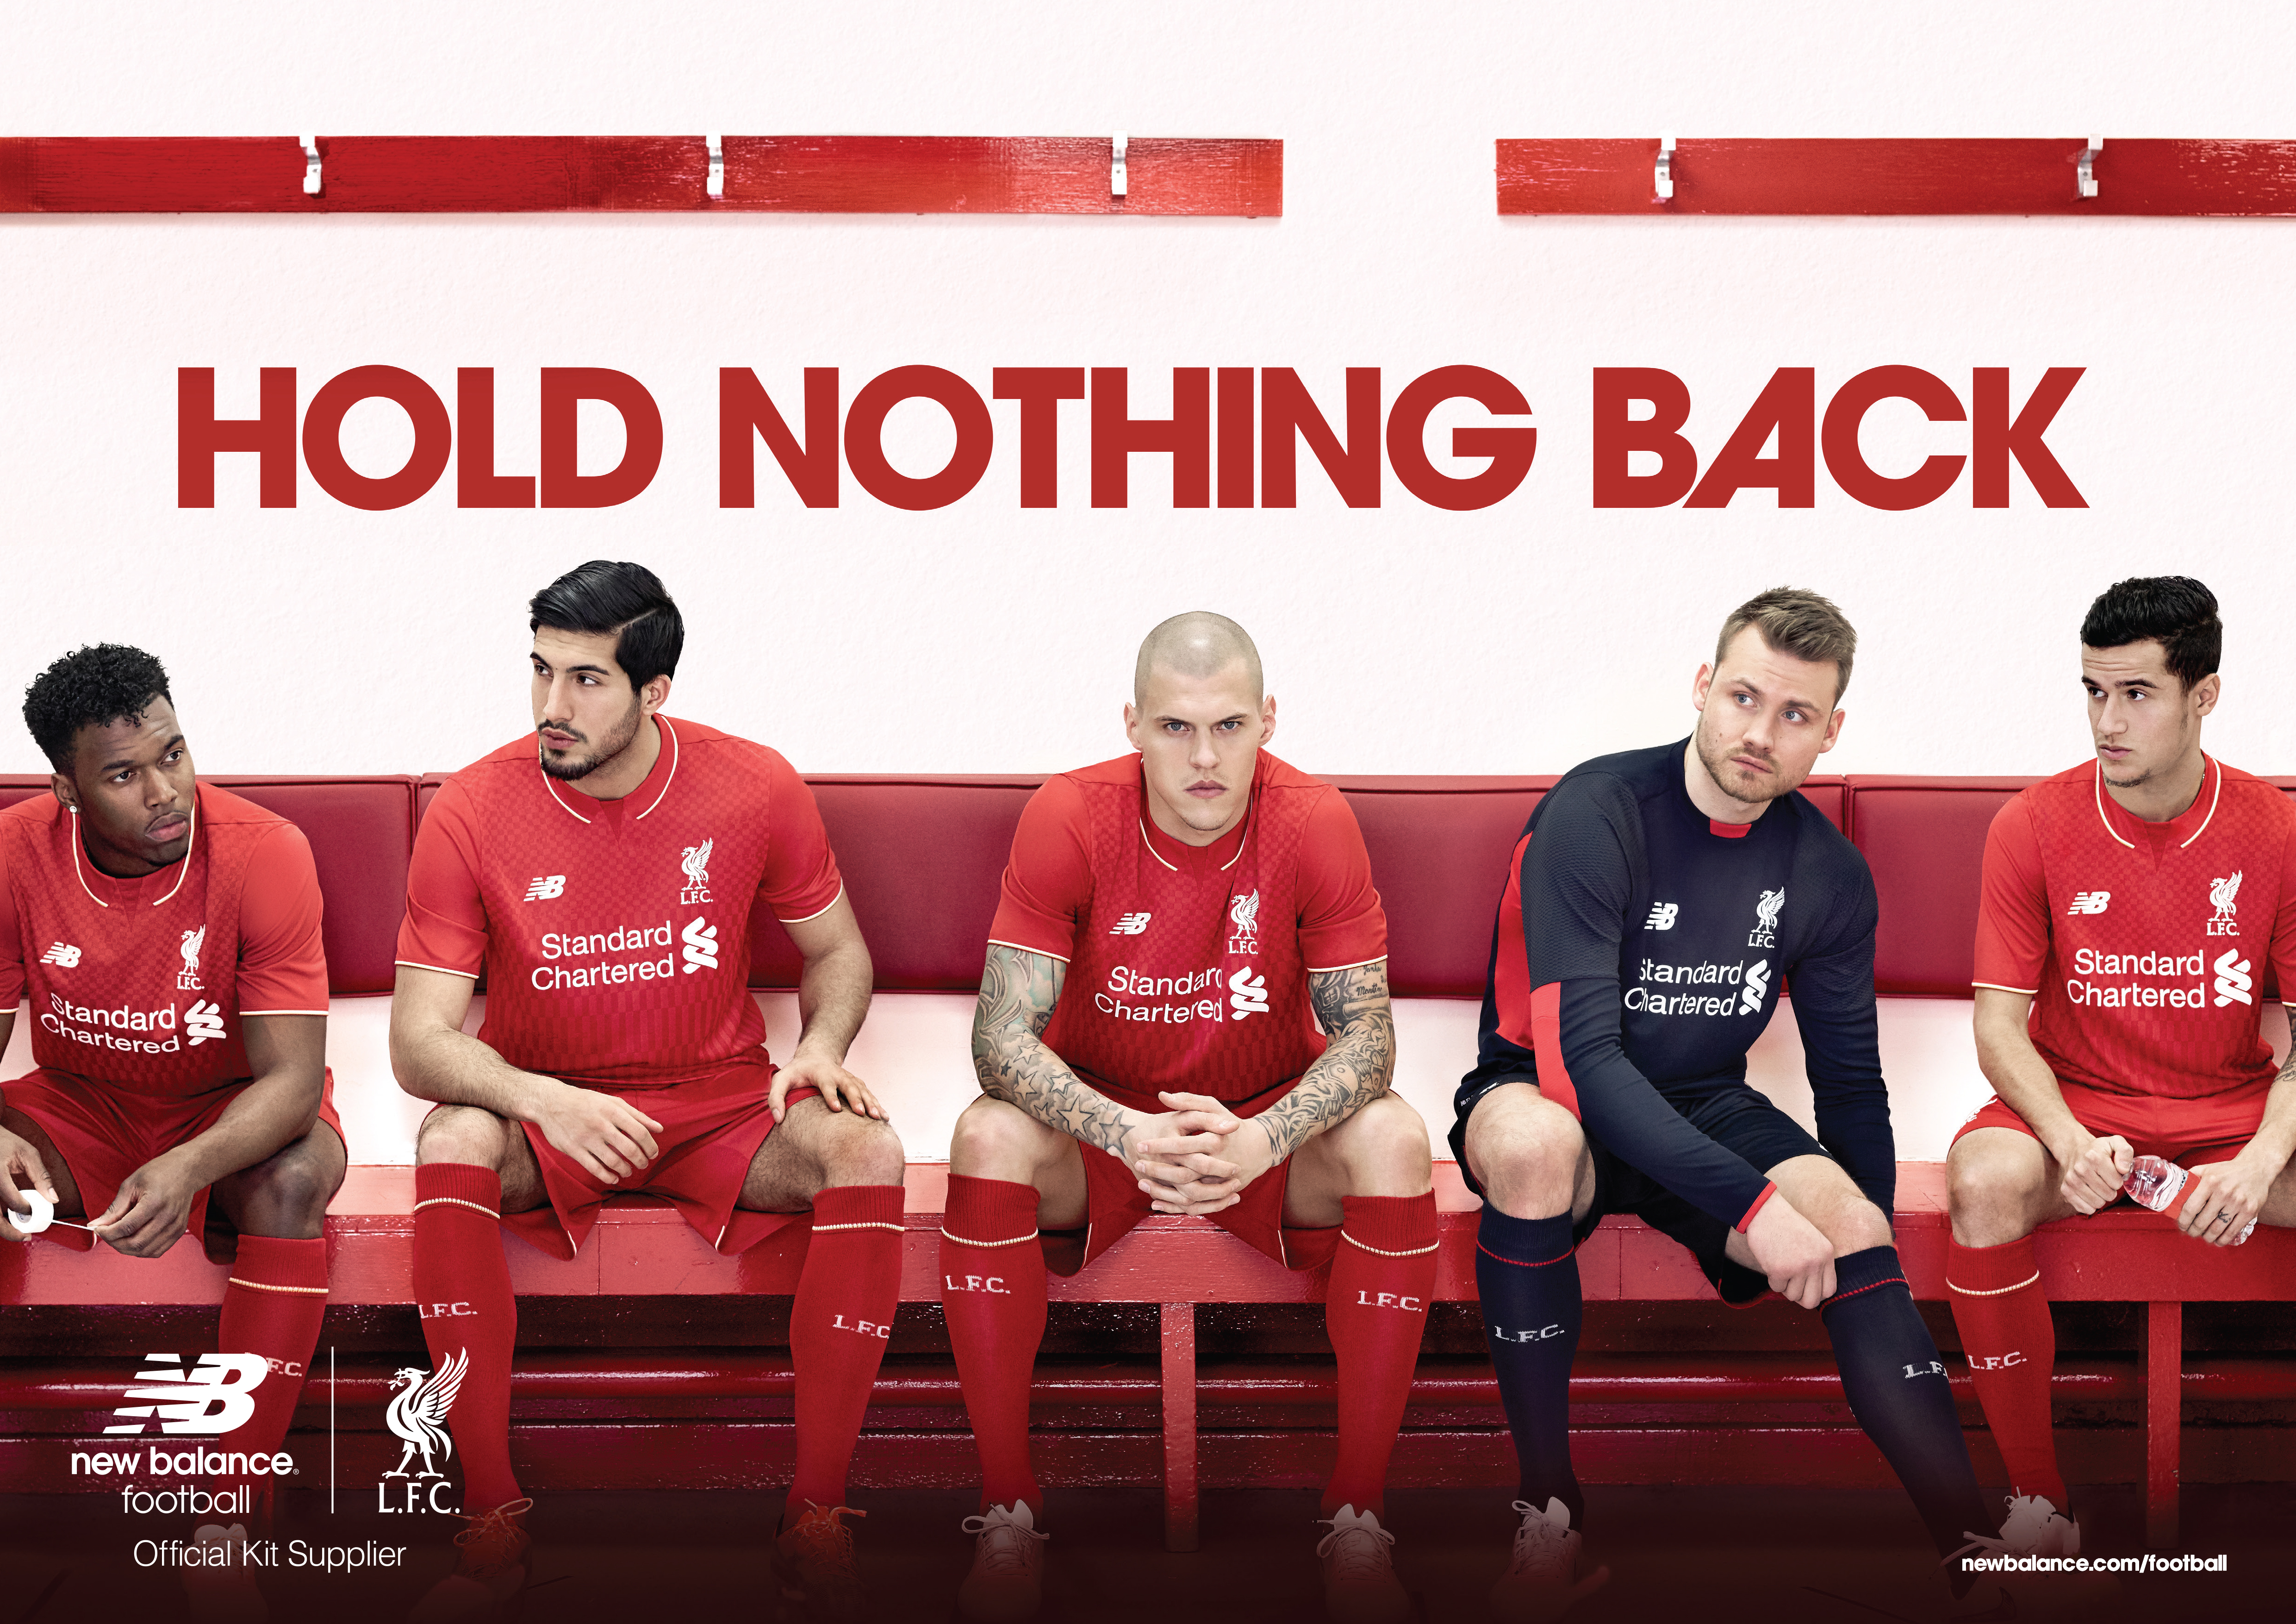 Liverpool Kit 1980 Liverpool fc Home Kit